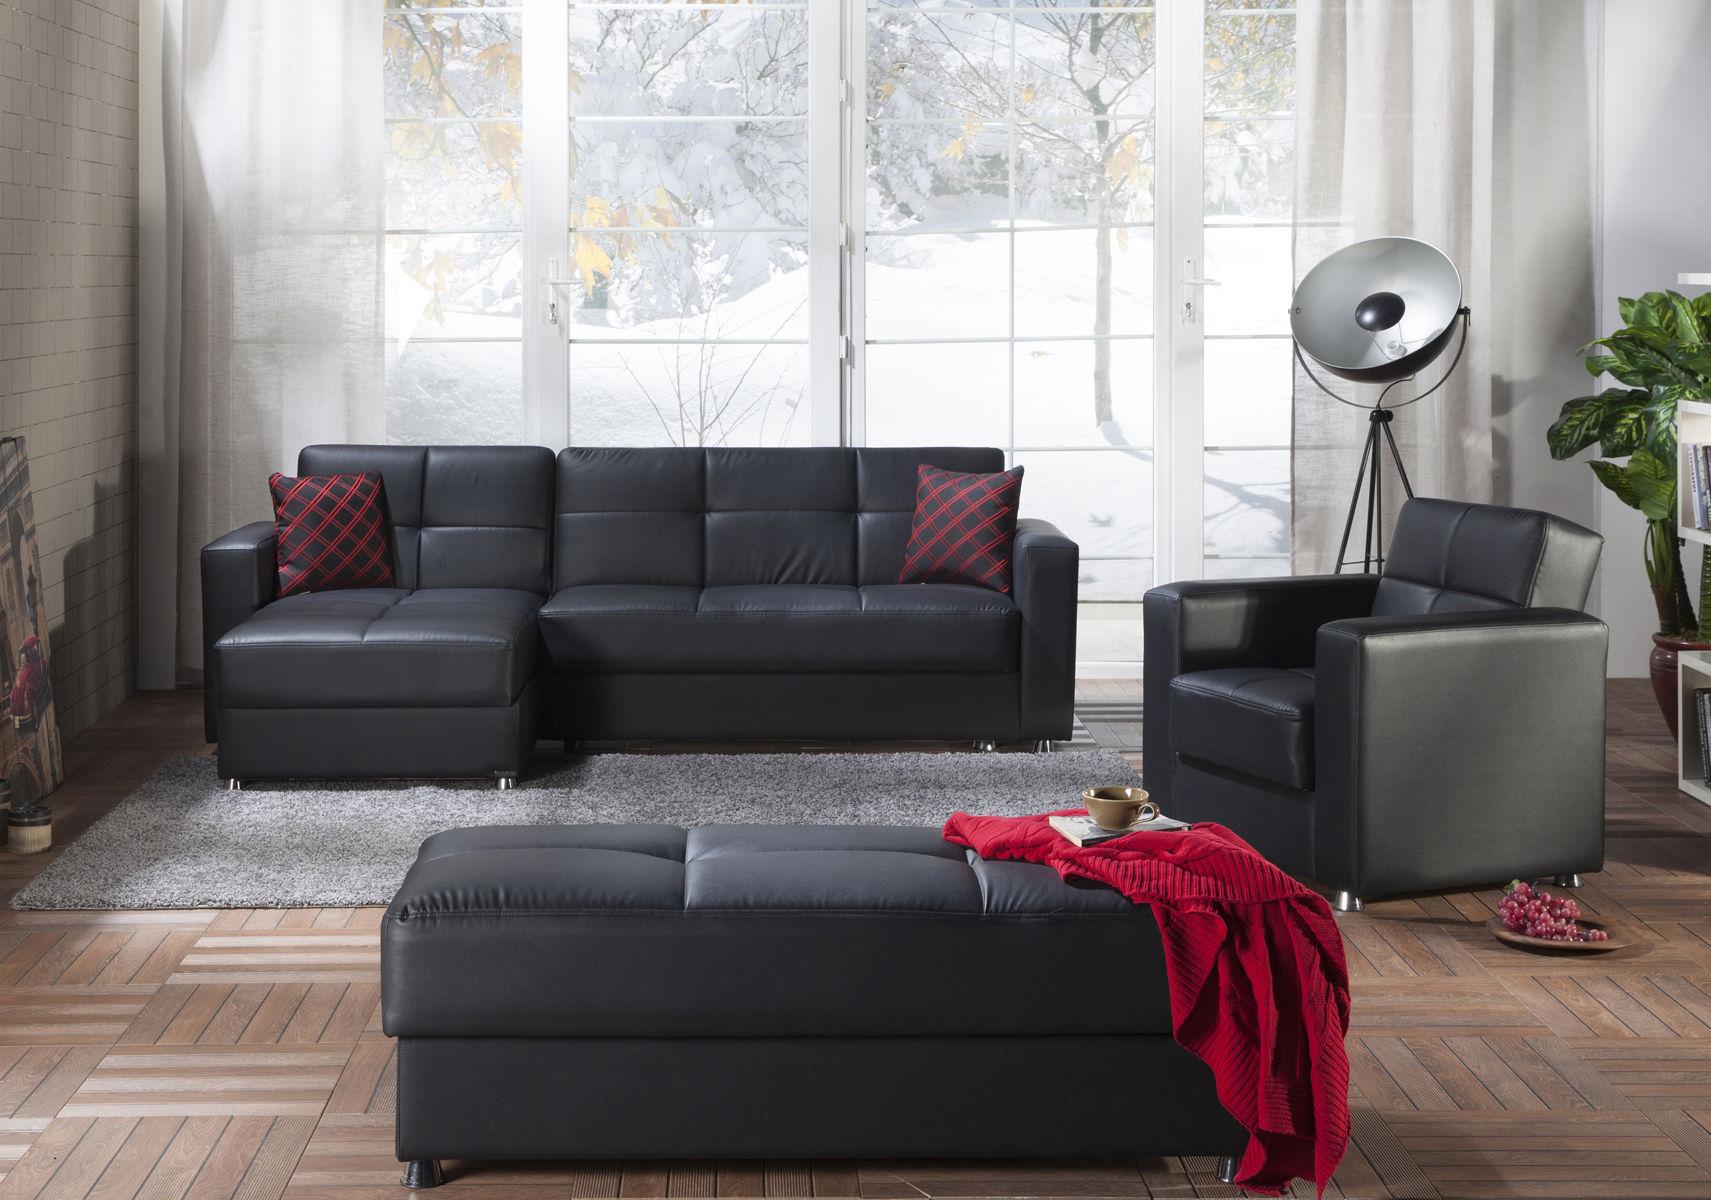 Elegant Black Sectional Sofa Elegant P658D Istikbal Throughout Elegant Sectional Sofas (View 3 of 15)